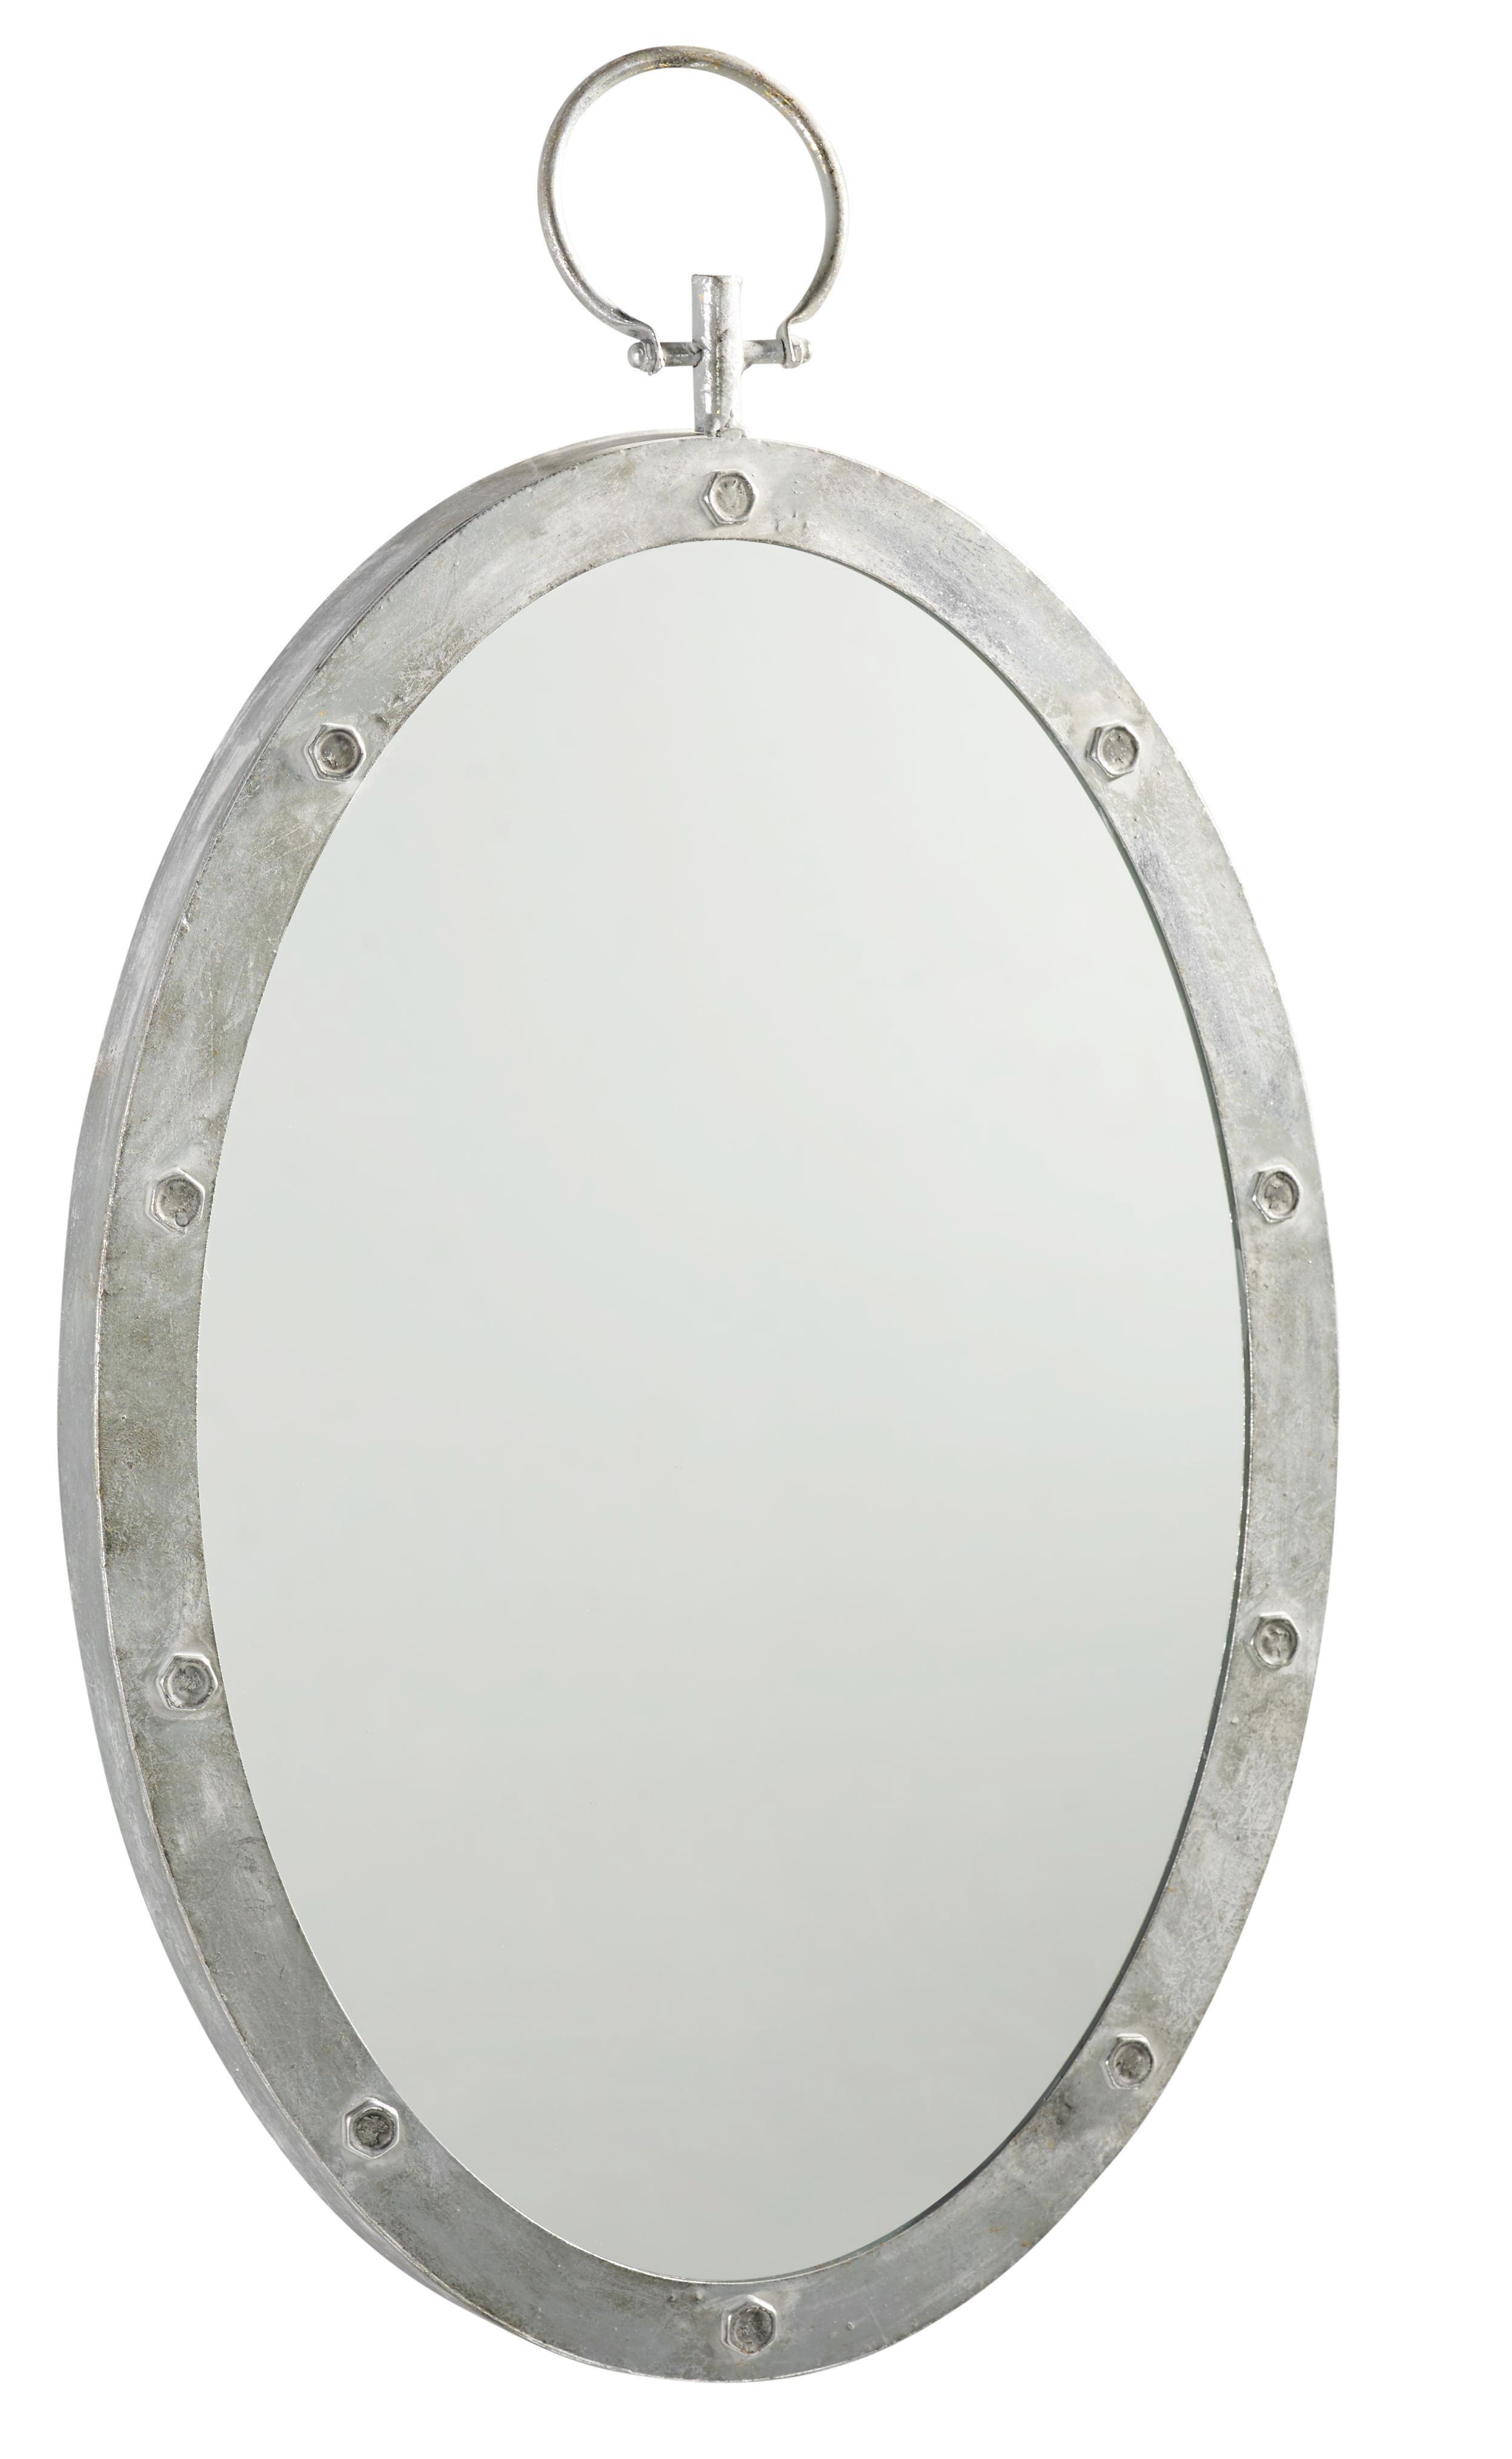 Wandspiegel Kara - Silberfarben/Grau, MODERN, Glas/Holzwerkstoff (45/70/4,5cm) - MÖMAX modern living